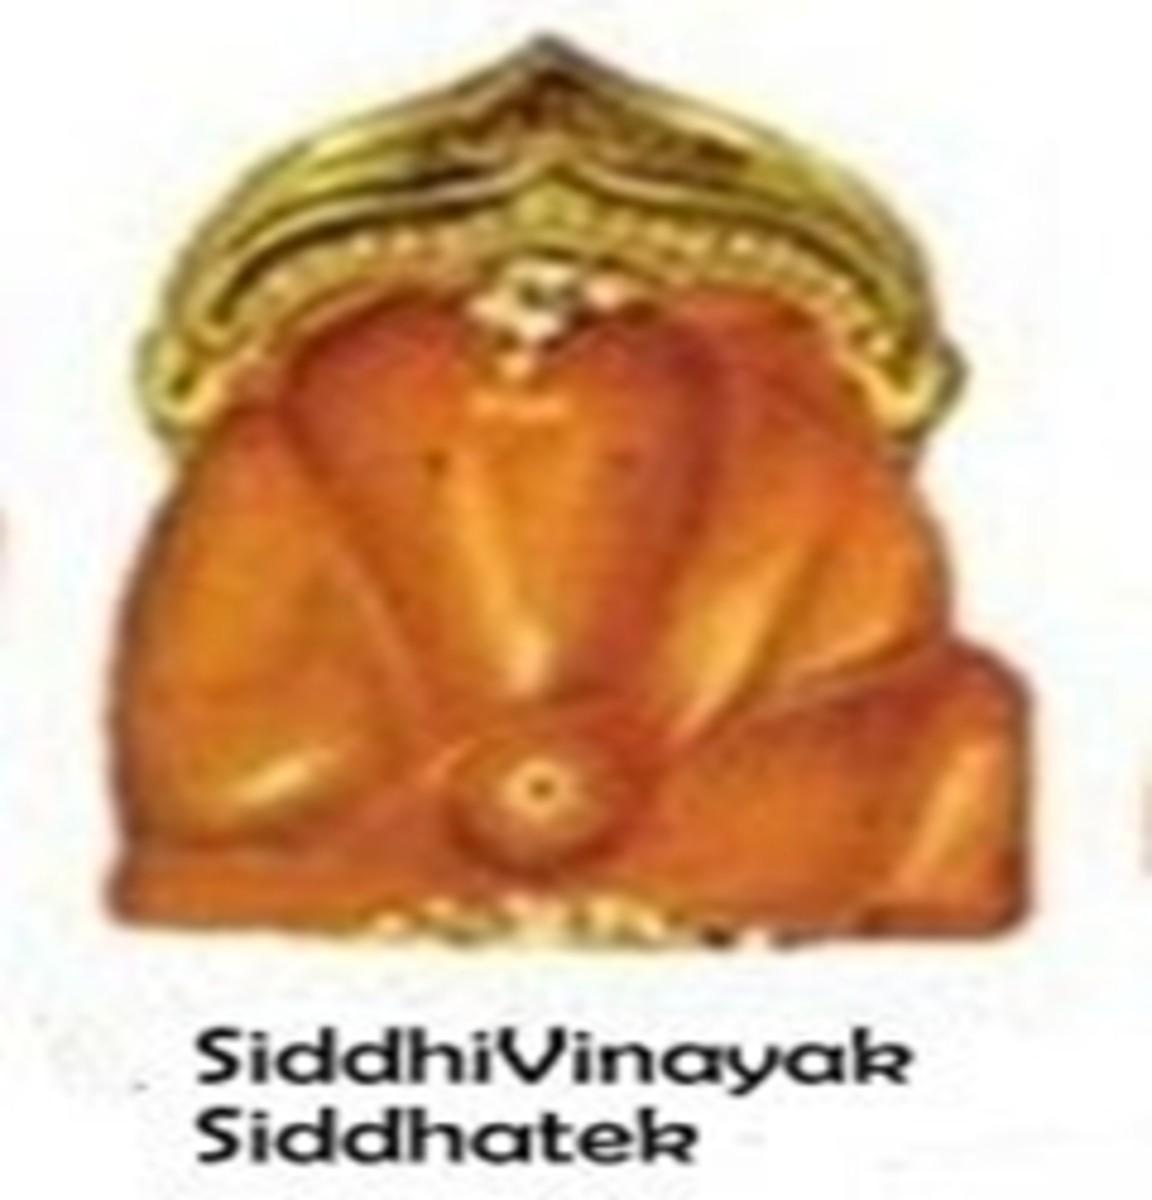 Shri Siddhi Vinayak Temple, Siddhatek